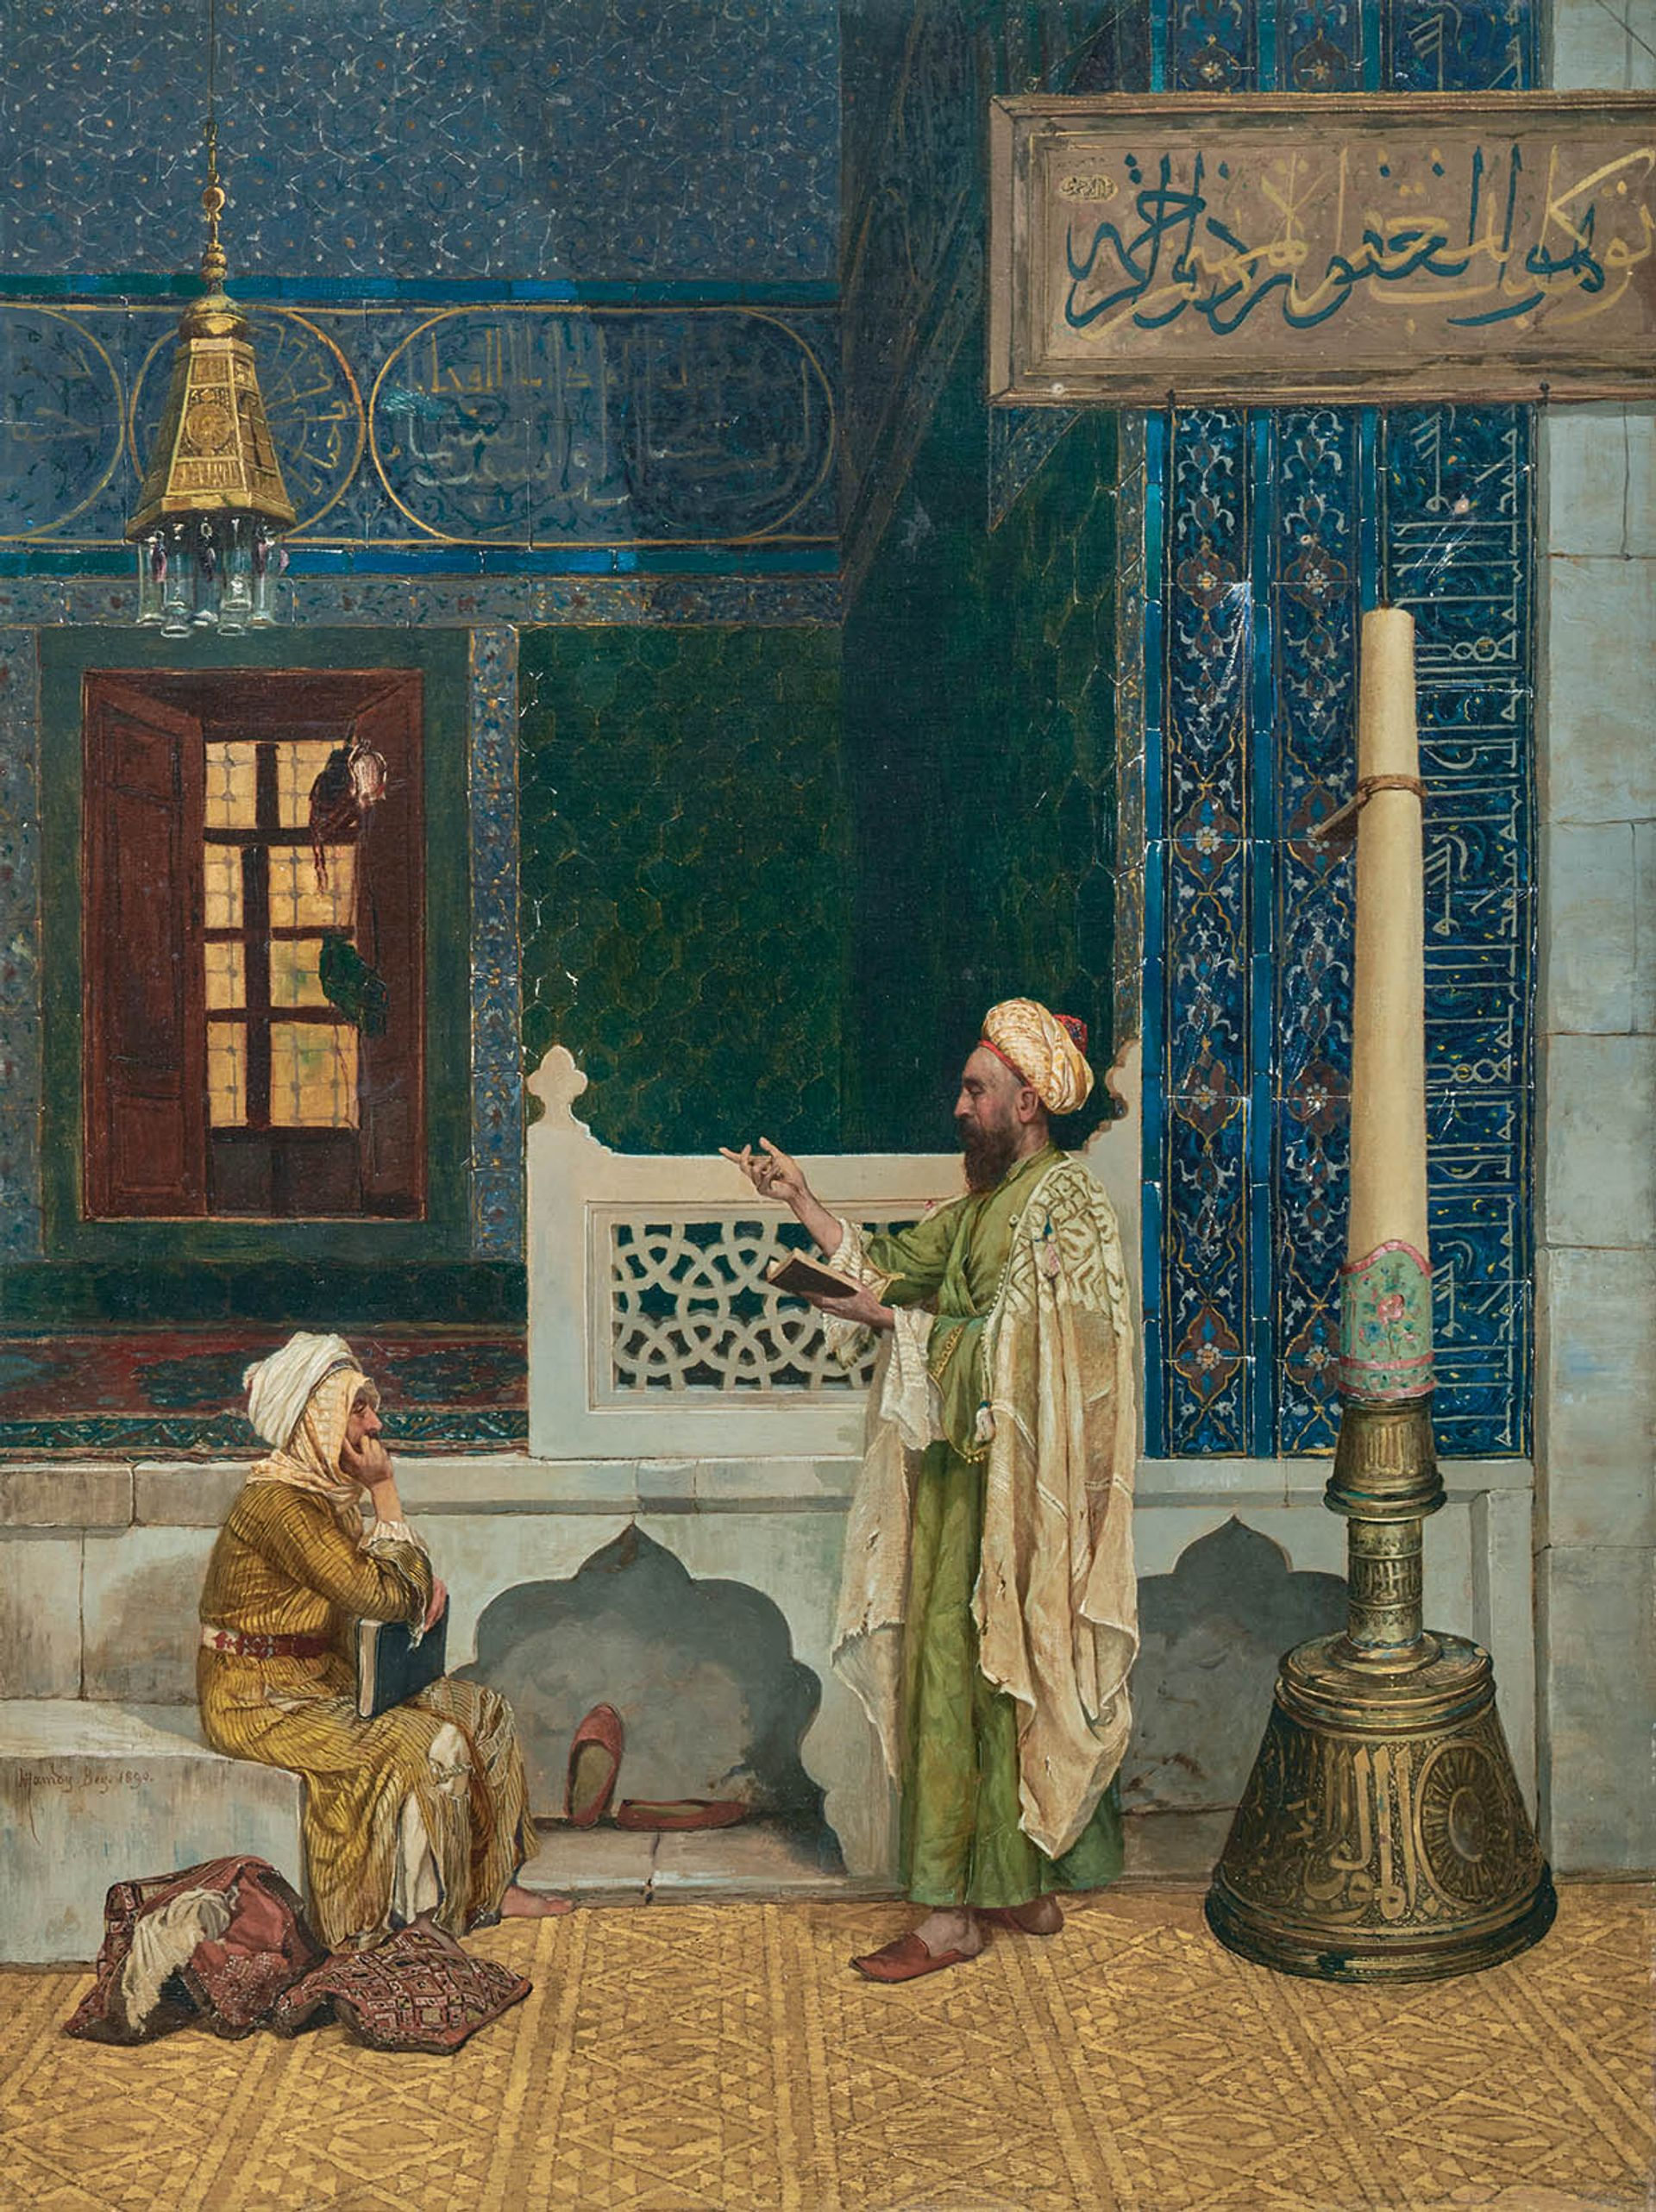 Osman Hamdy Bey's record-breaking Koranic Instruction Courtesy of Sotheby's